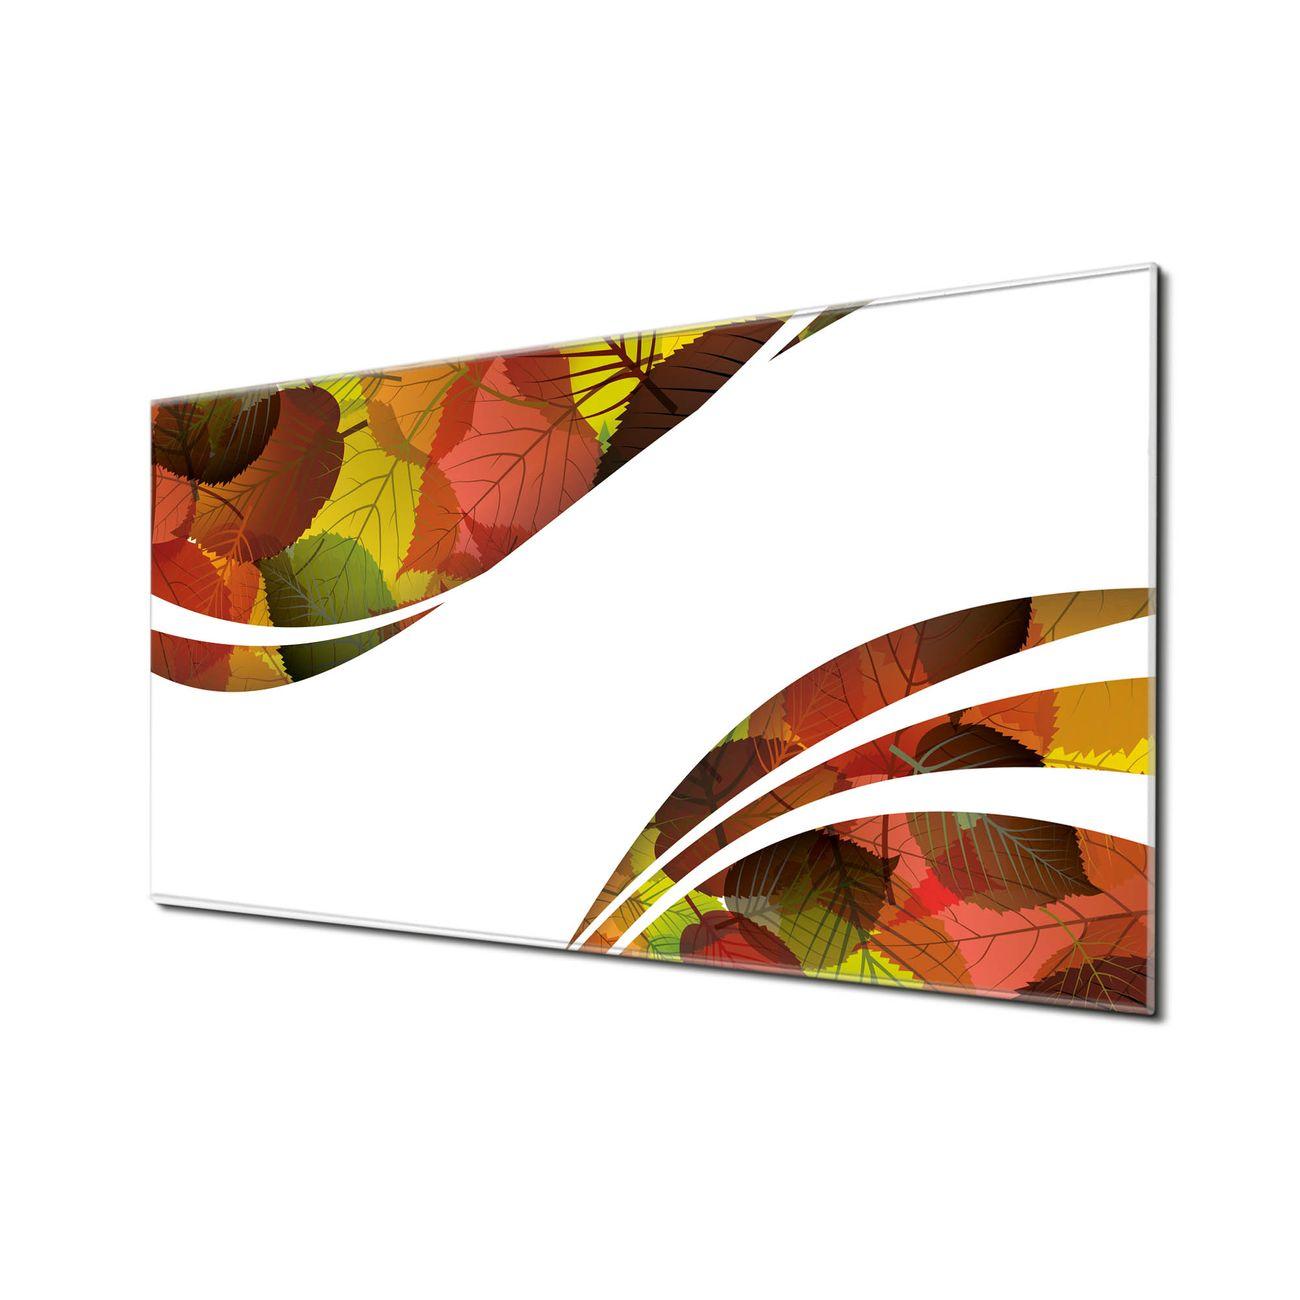 Küchenrückwand Glas Motiv Herbstlaub